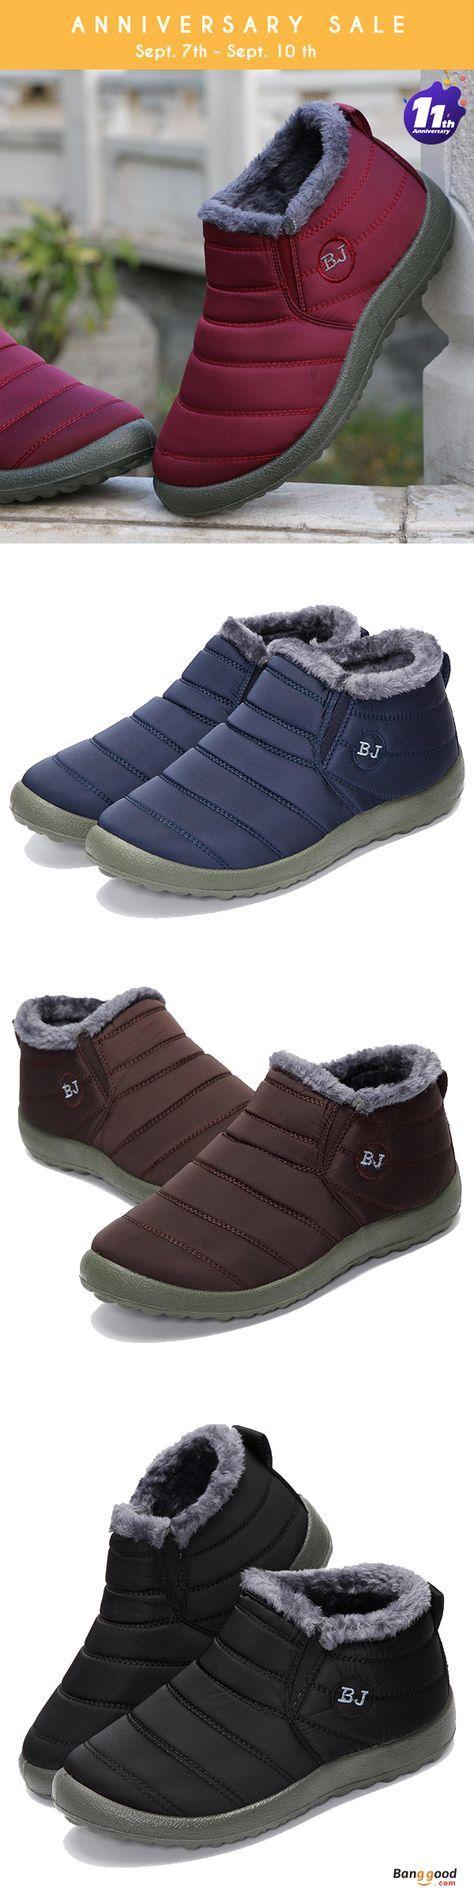 Greenz Vicki damas gris antideslizante en tazones zapatos, talla 6